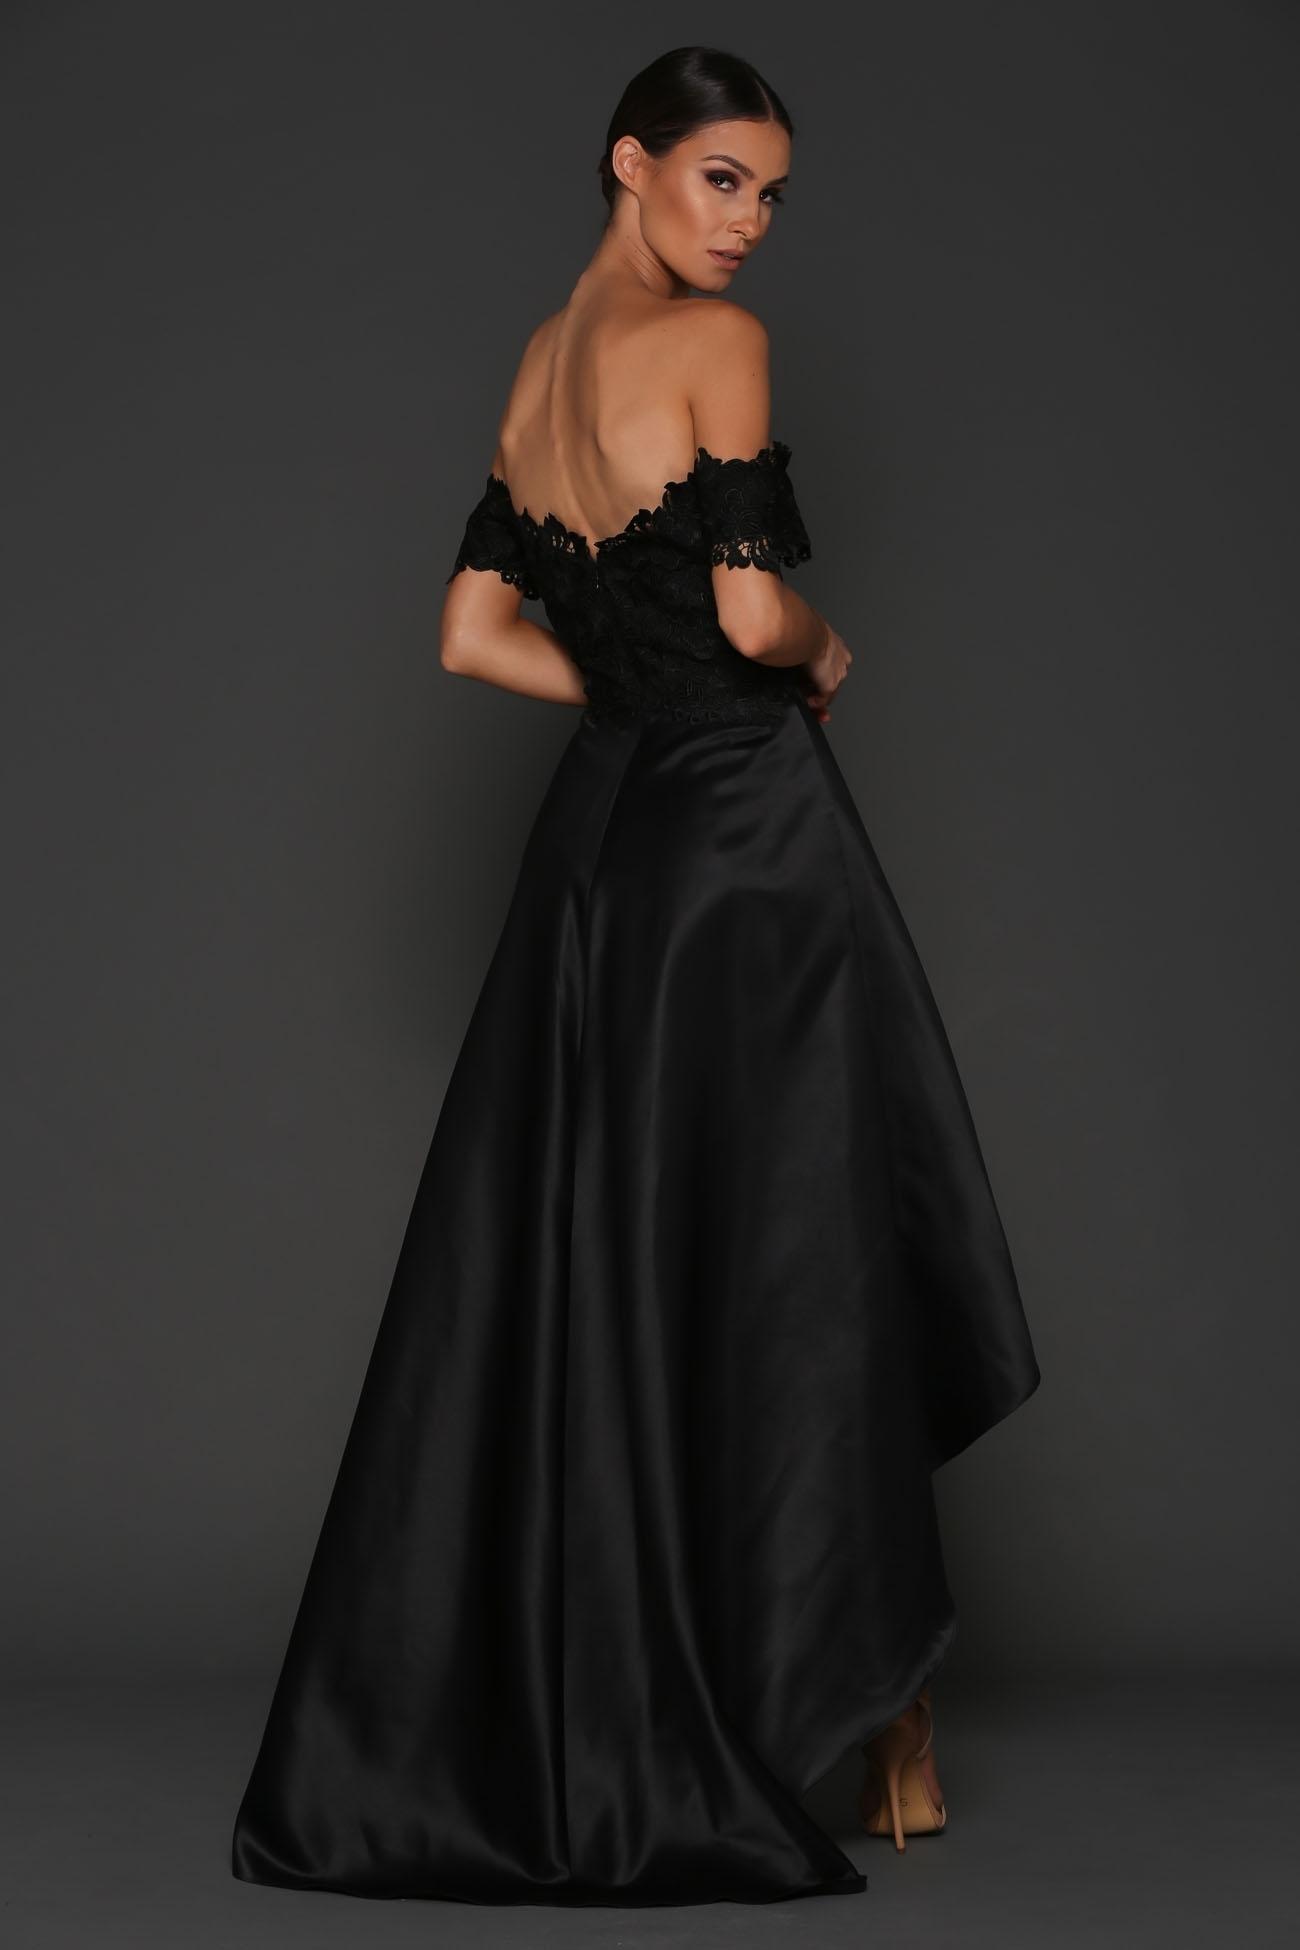 054c484b838 Elle Zeitoune Rosie Strapless Black Lace Dress Size 10